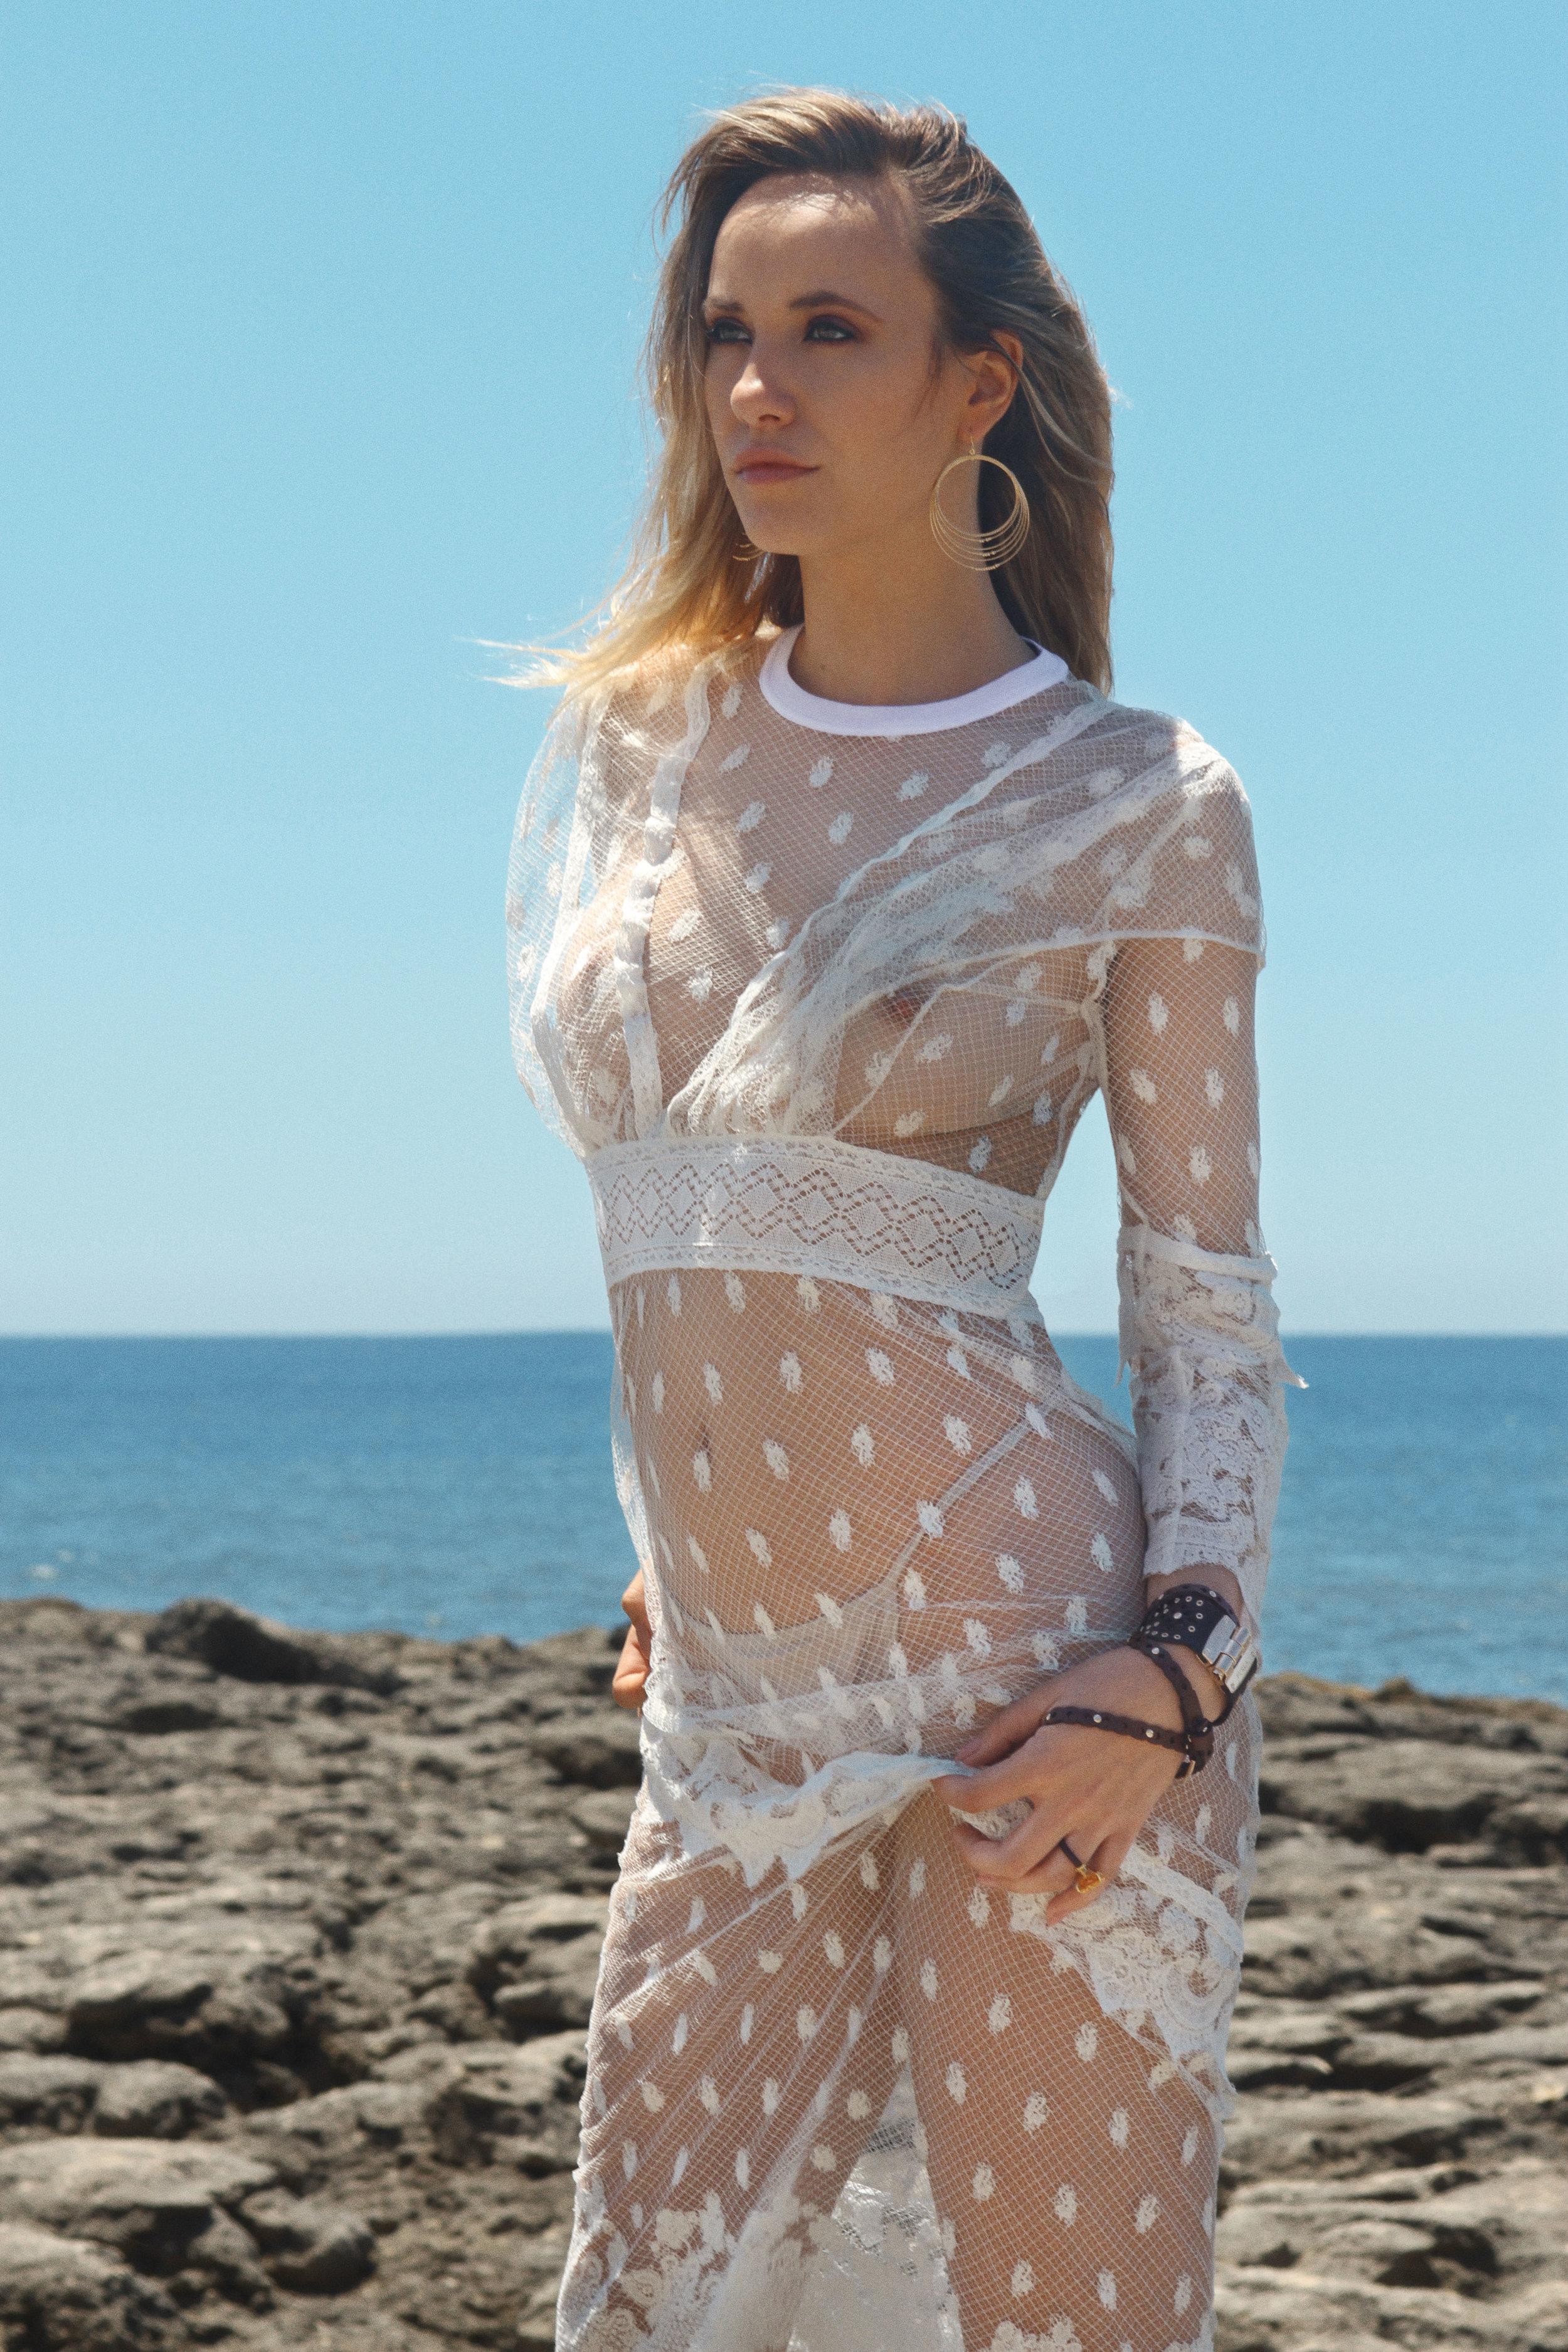 Lace dress Burberry, Leather bracelets Furla, Ring TOUS, Earrings Accessorize